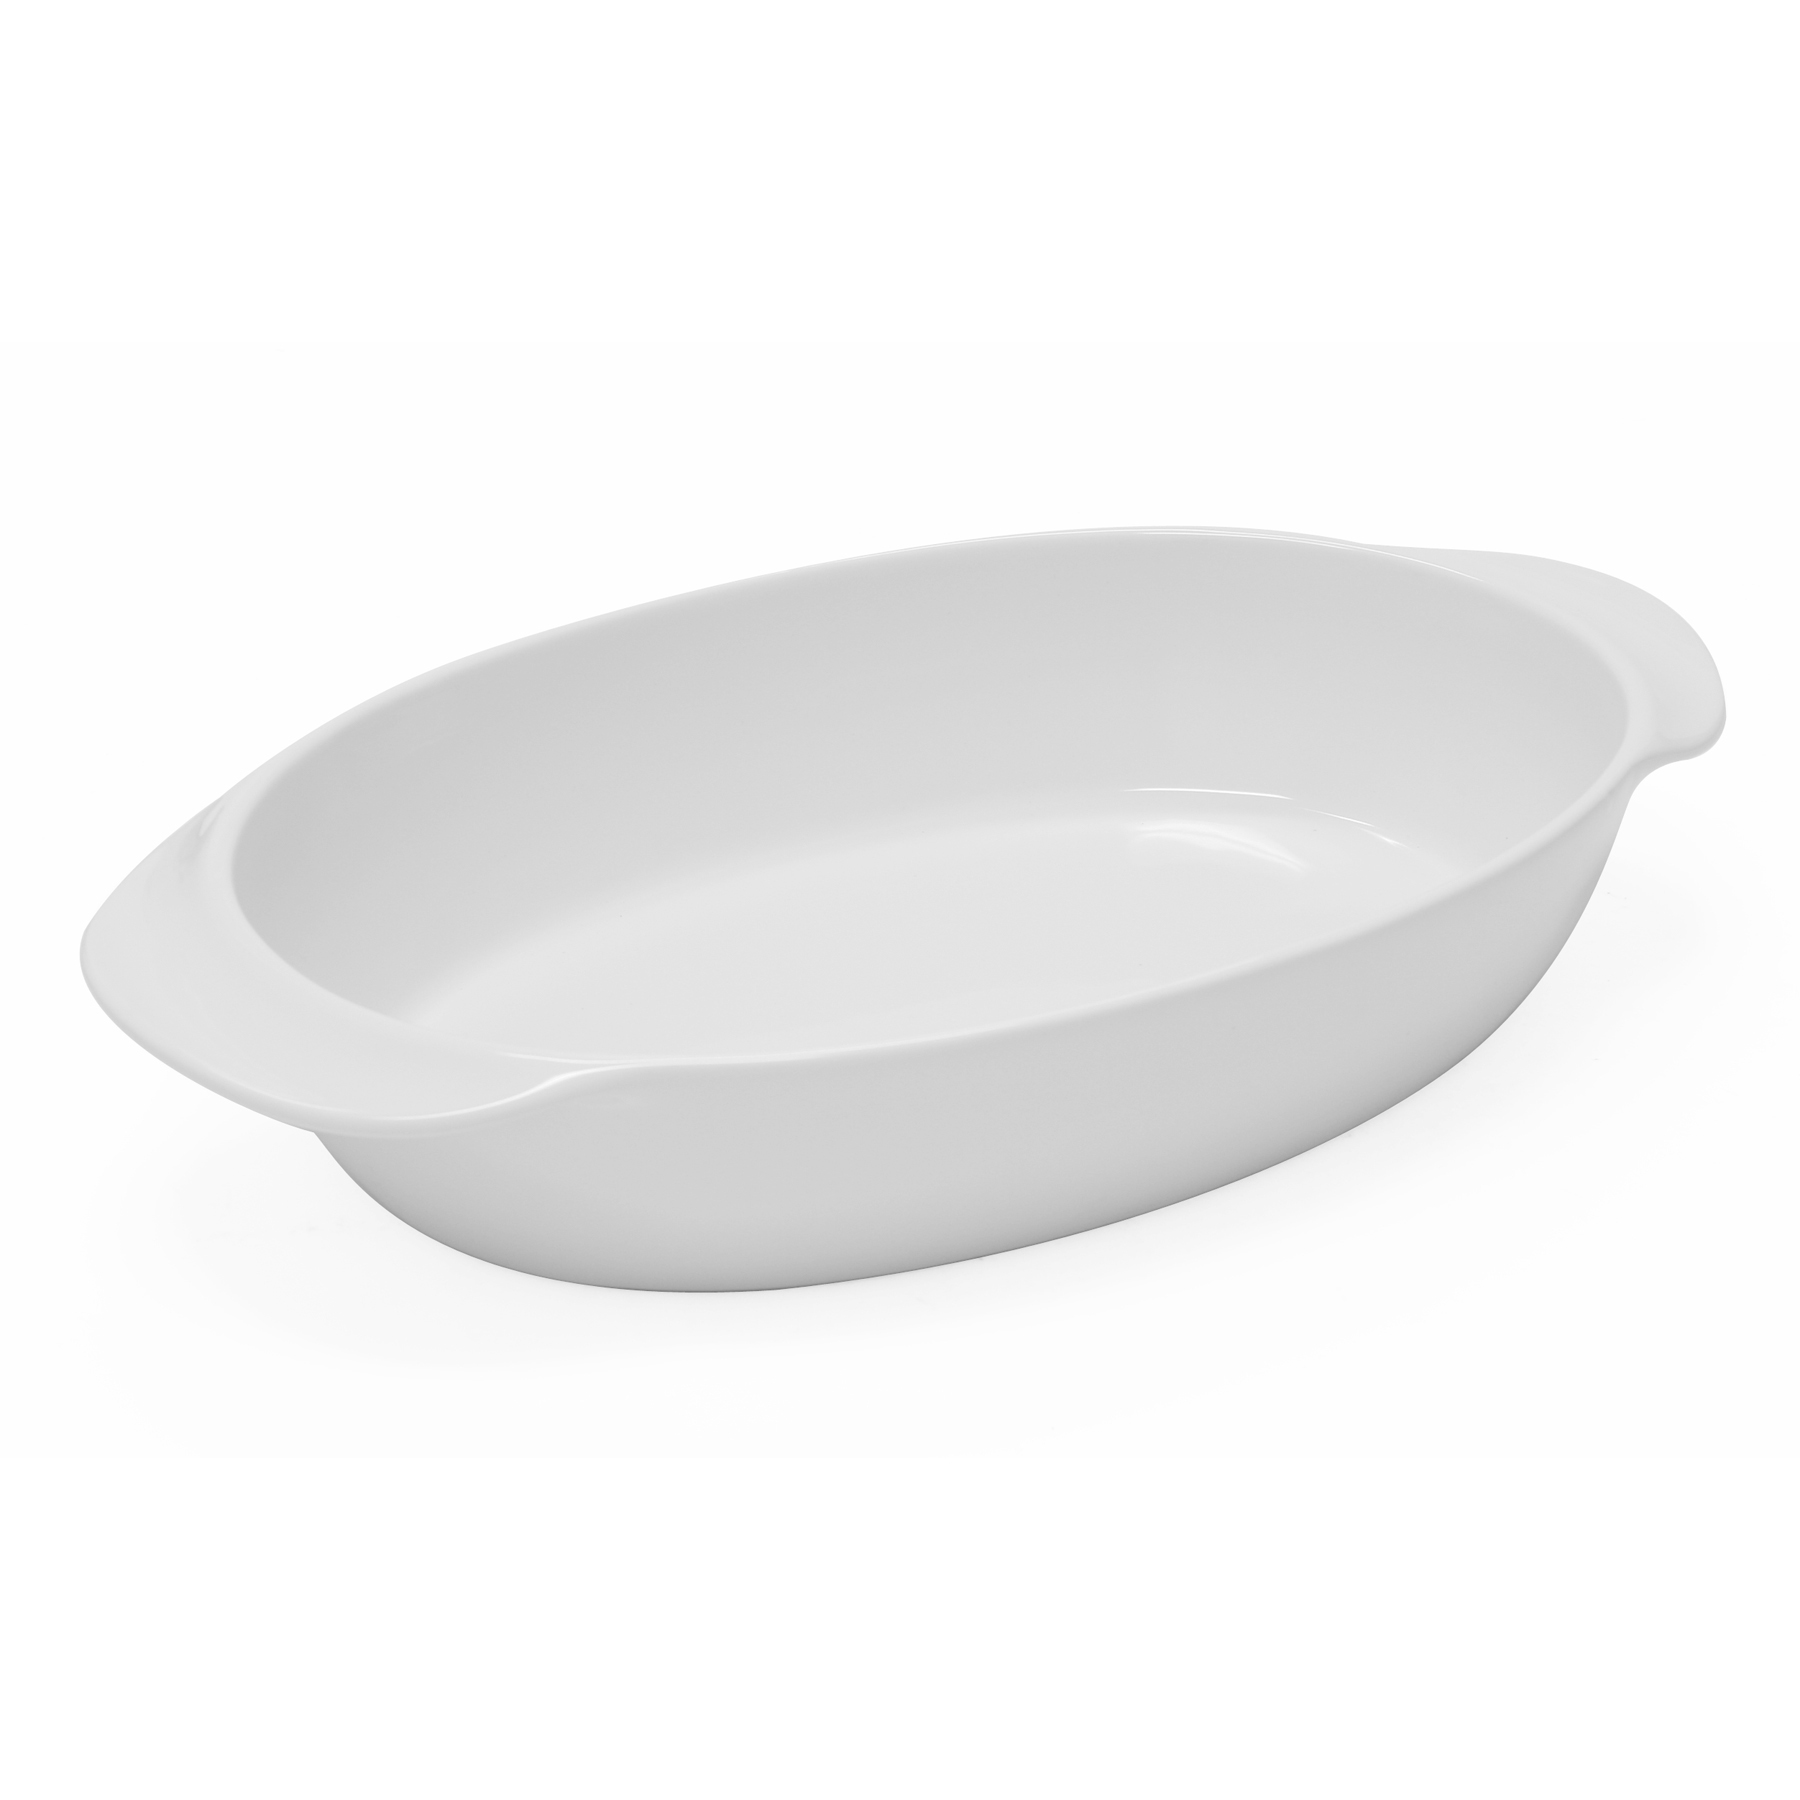 Chantal Glossy White Classic Oval Baking Dish, 4.5 Quart